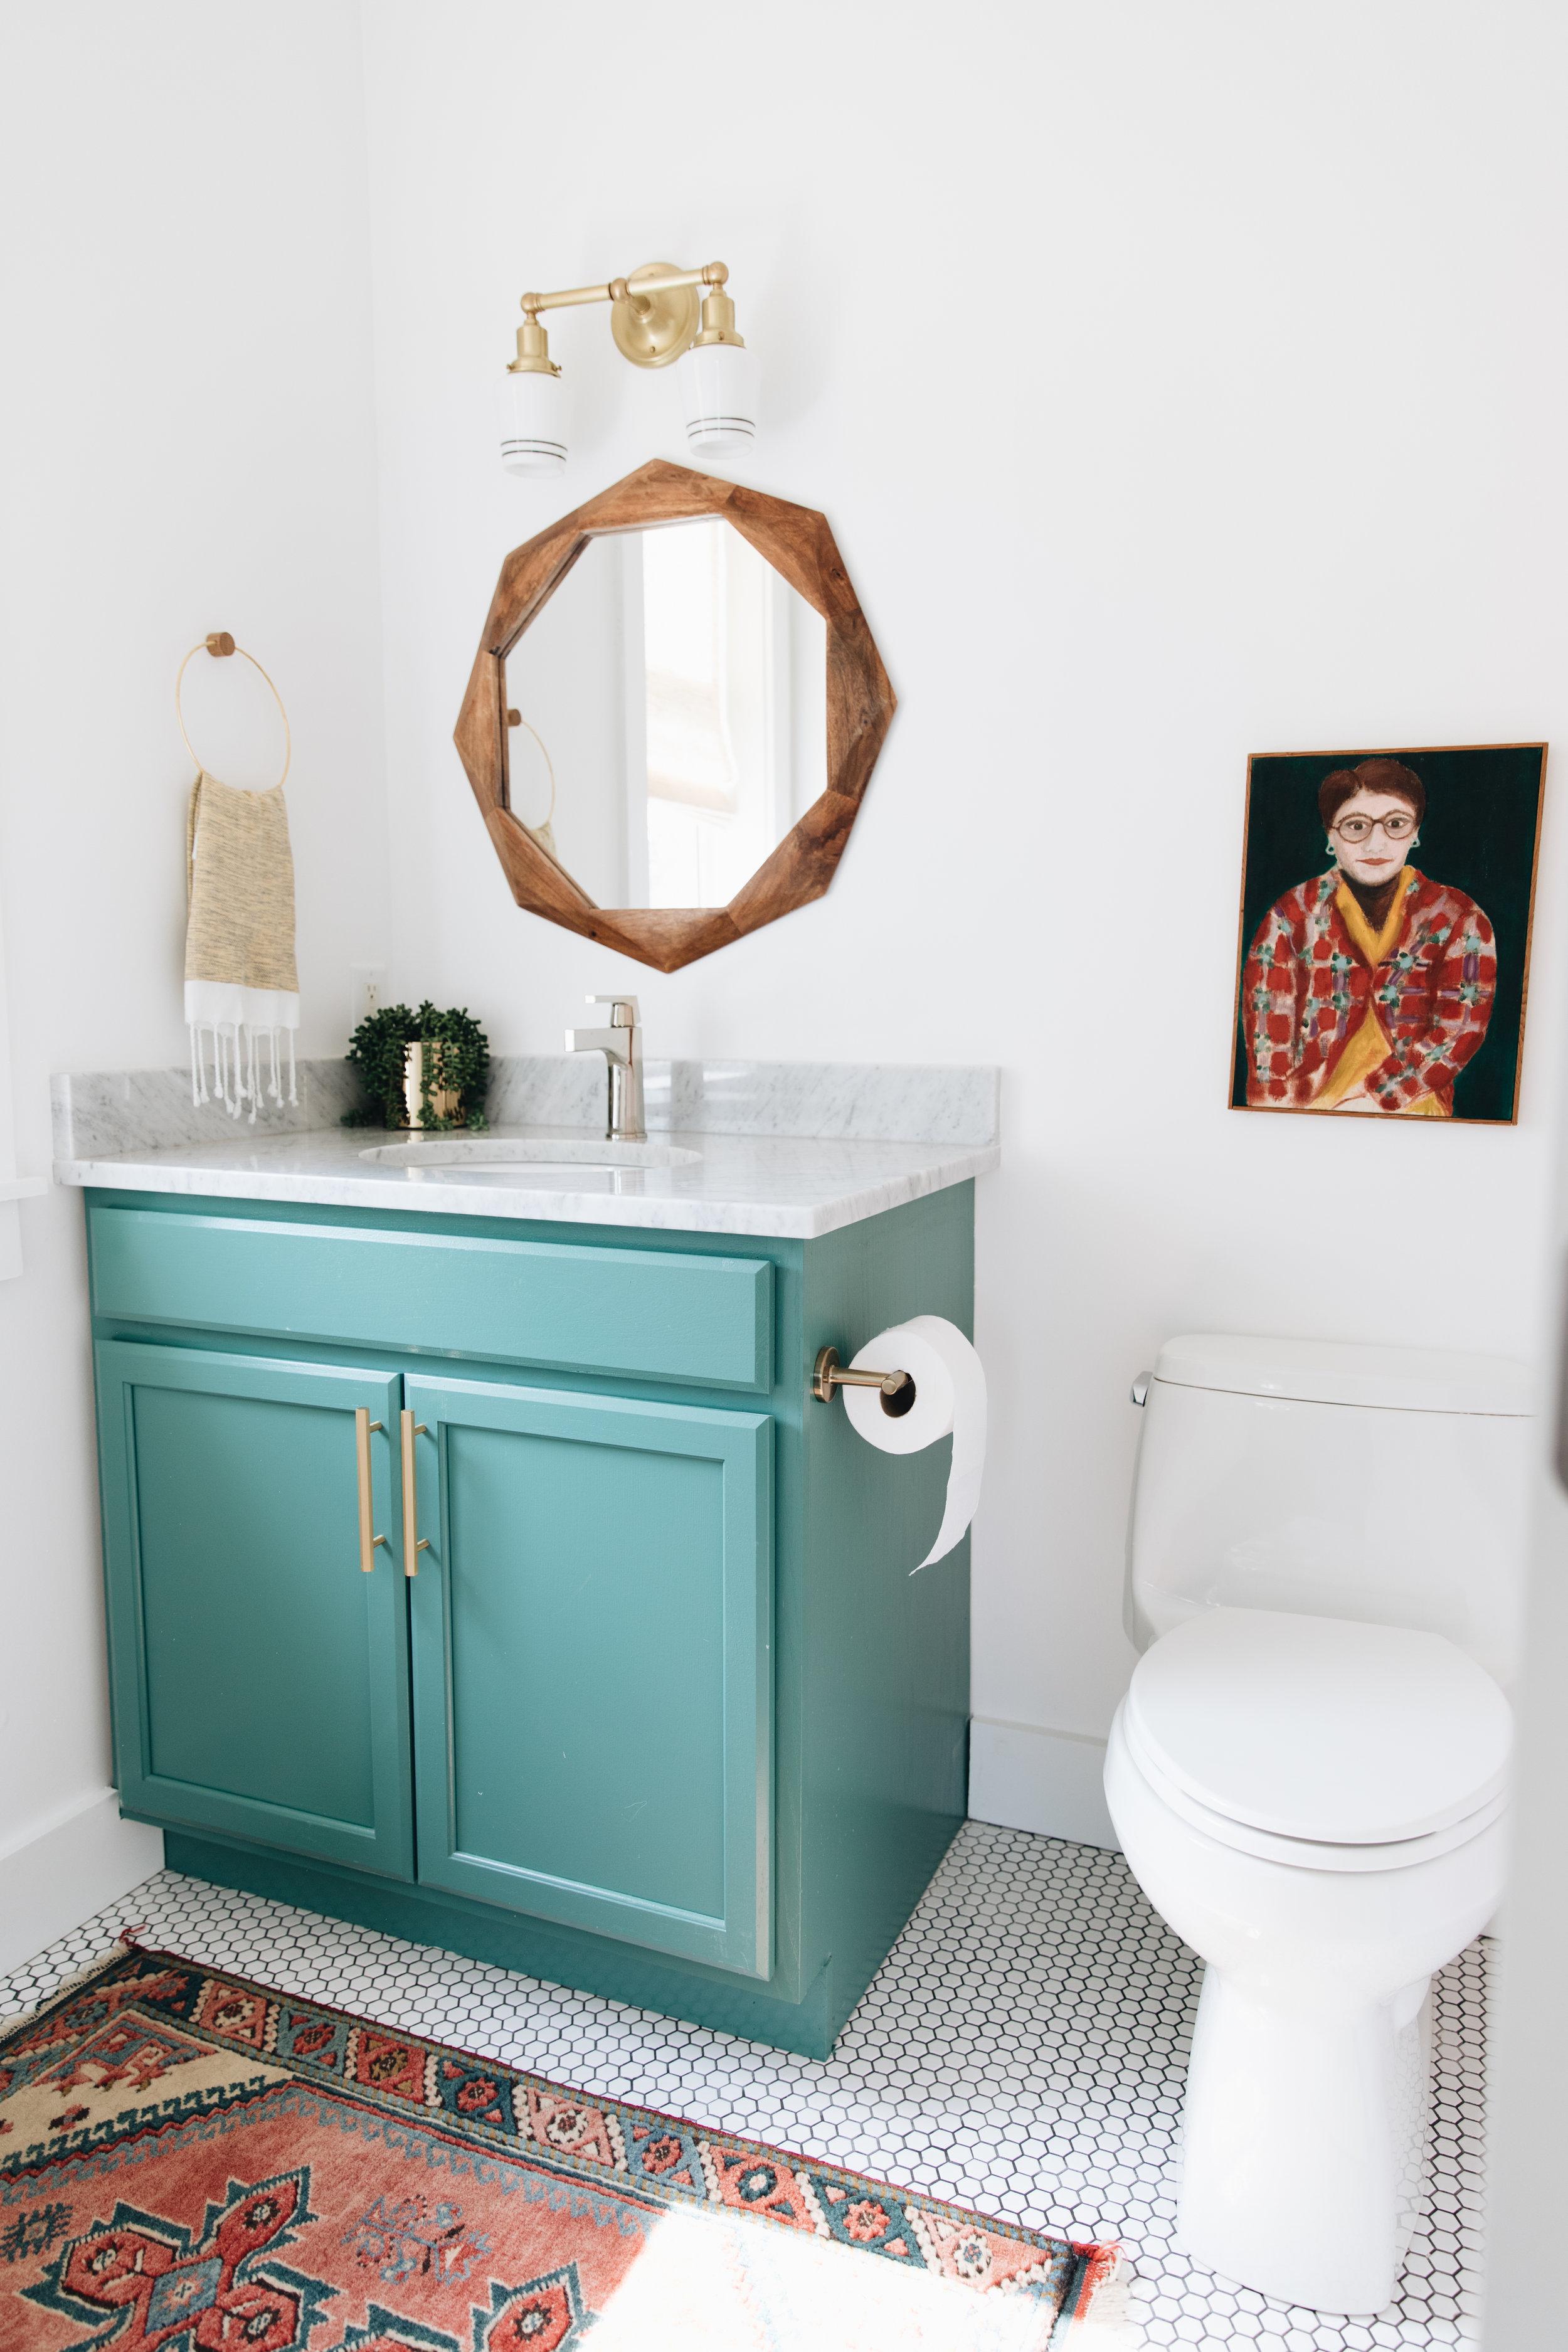 Sconces    Brass Handles    Floor Tile    Hand Towels